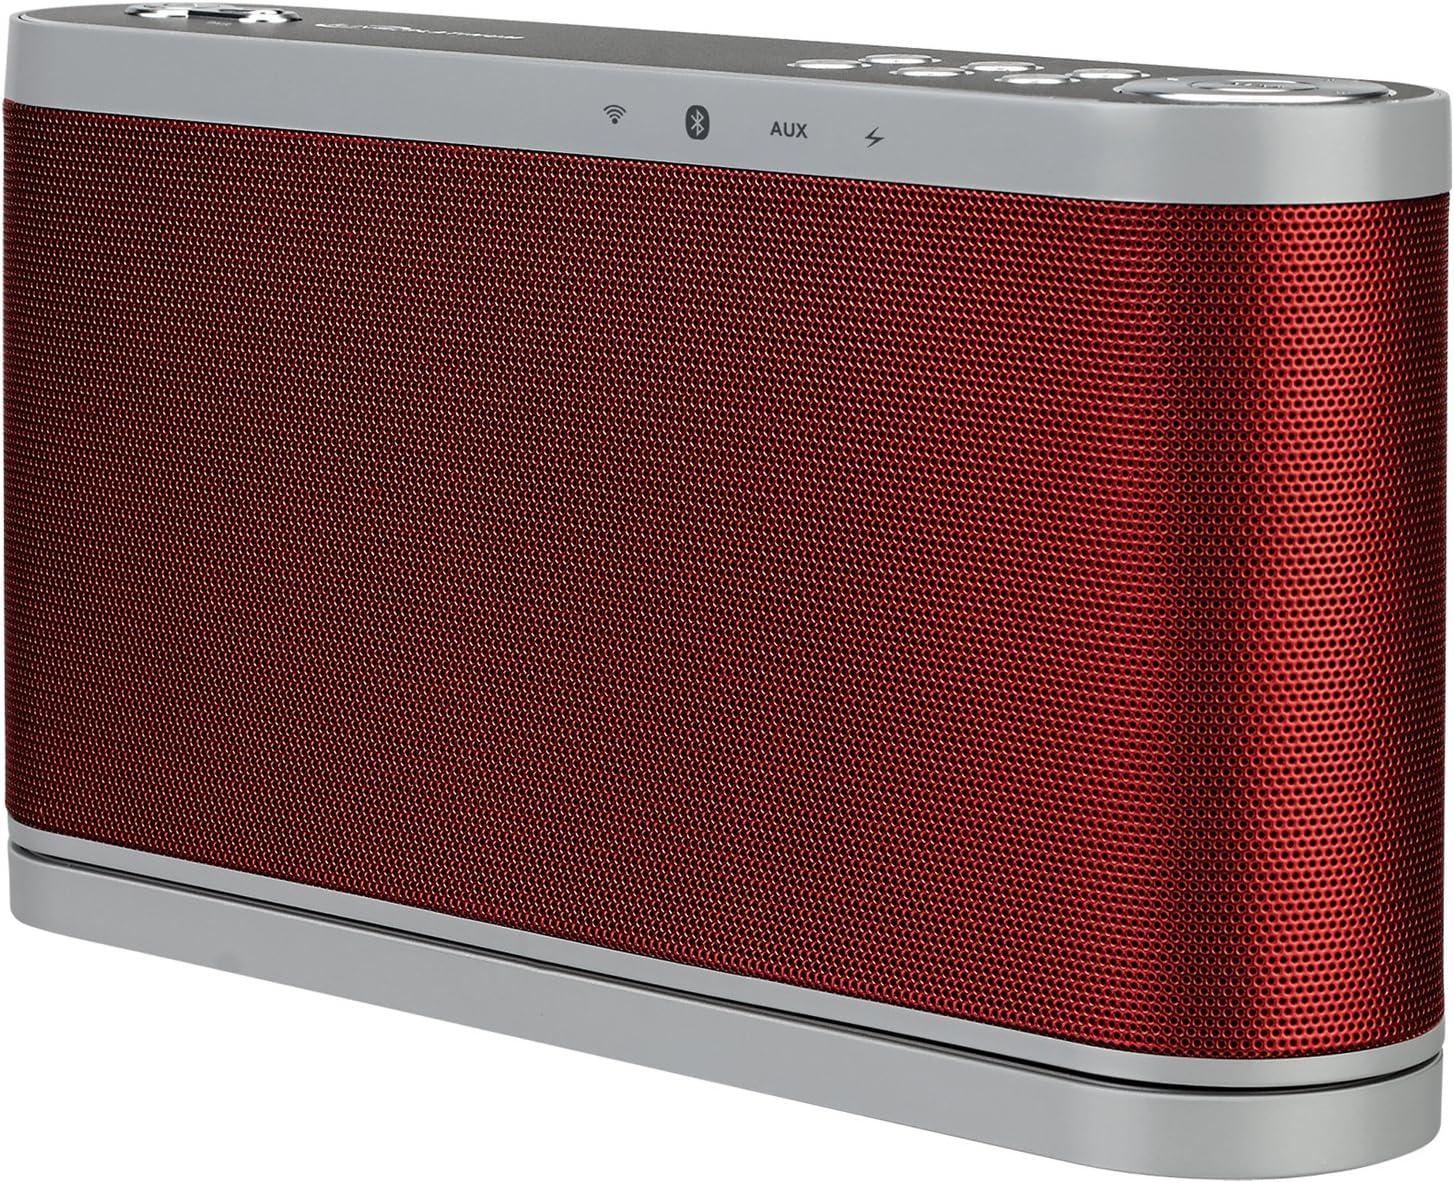 iLive Wireless Multi-Room Wi-Fi Io 安売り キャンペーンもお見逃しなく Rechargeable Lithium Speaker